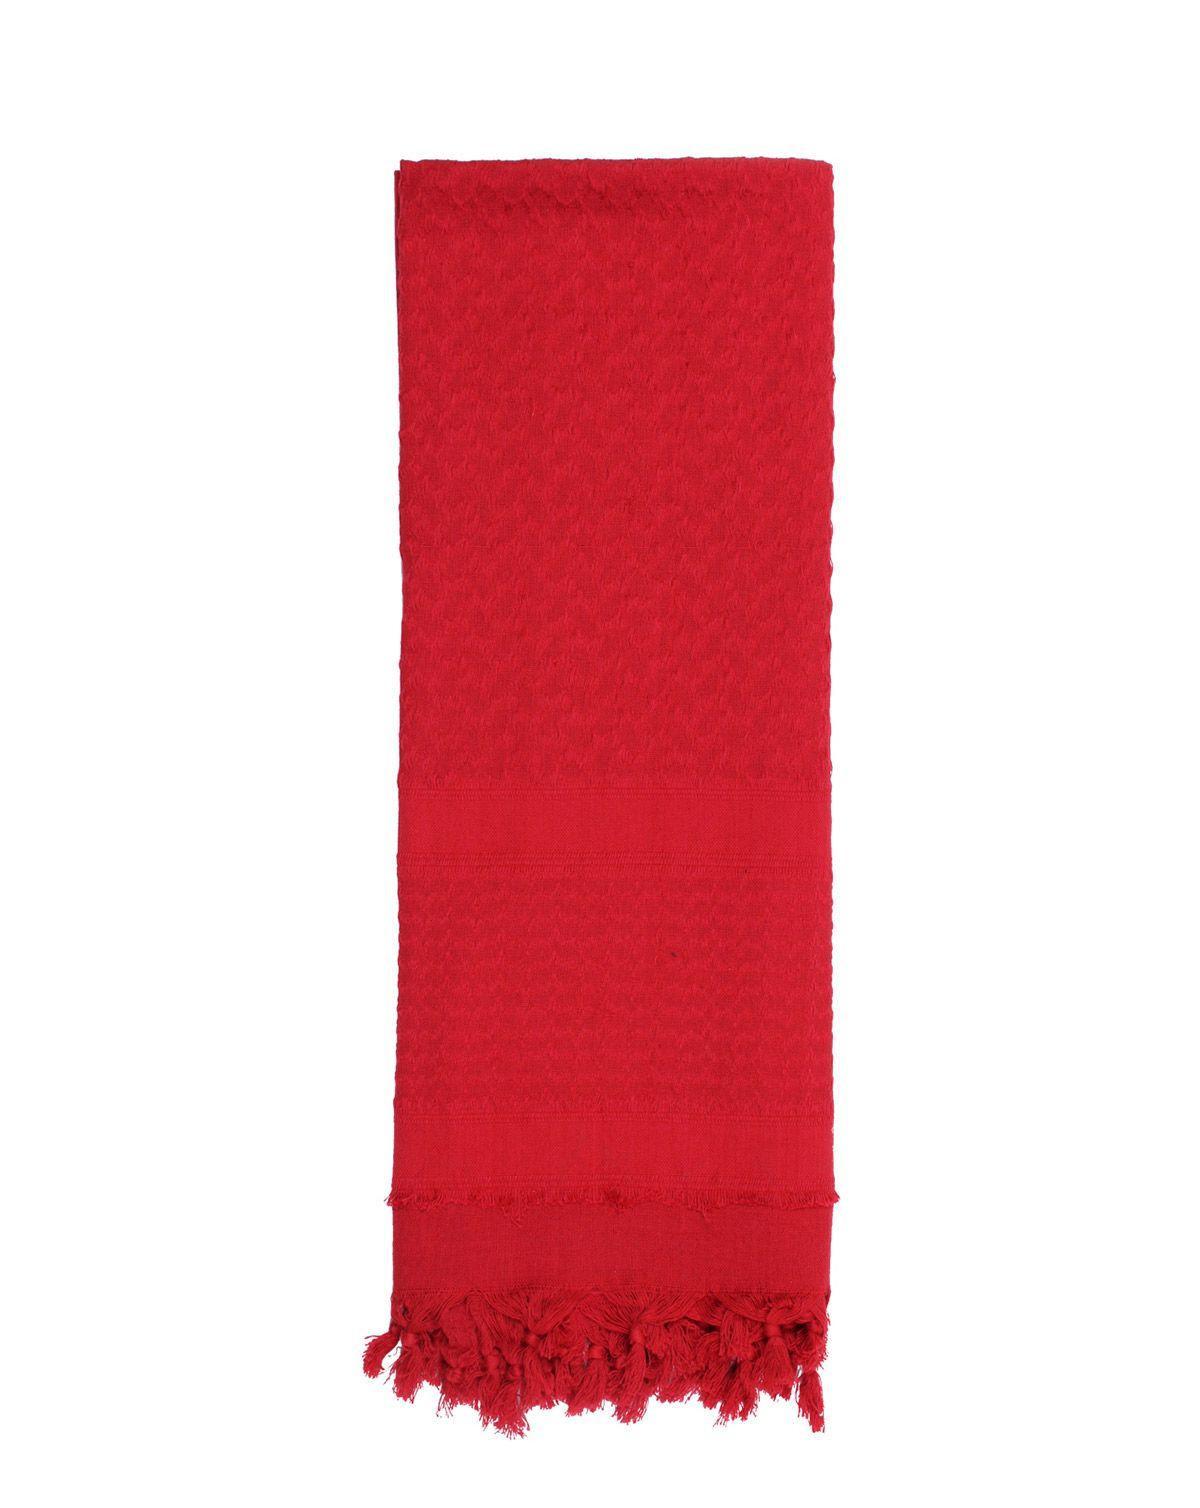 Image of   Rothco Deluxe Partisan Tørklæde Ensfarvet (Rød, One Size)